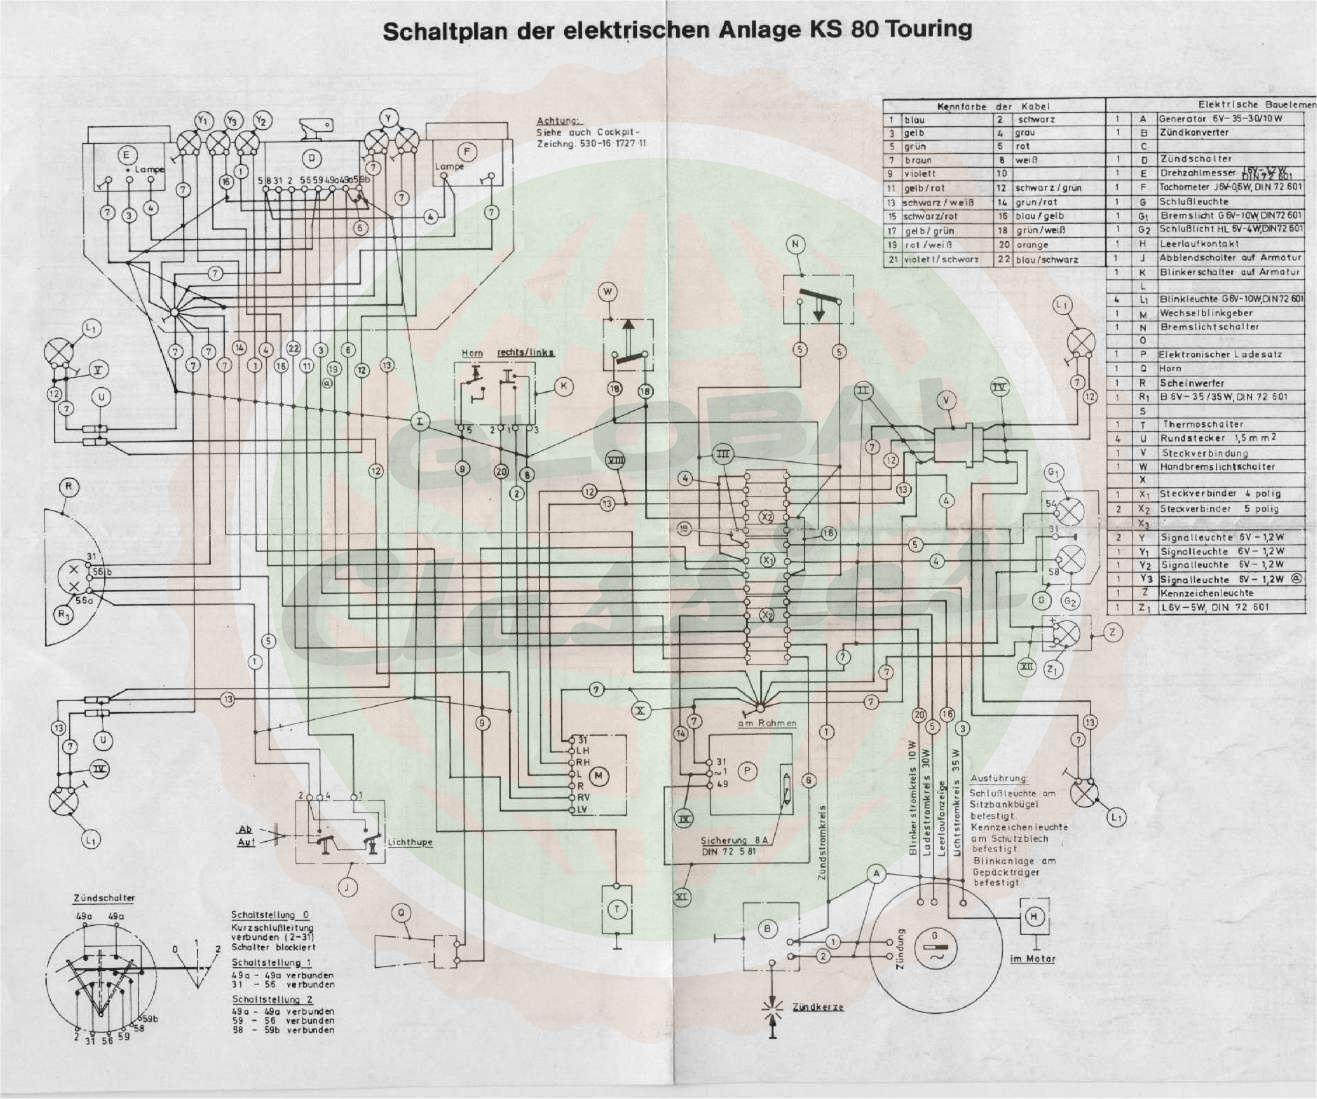 Atemberaubend 72 Super Elektrischer Steuerschaltplan Ideen ...